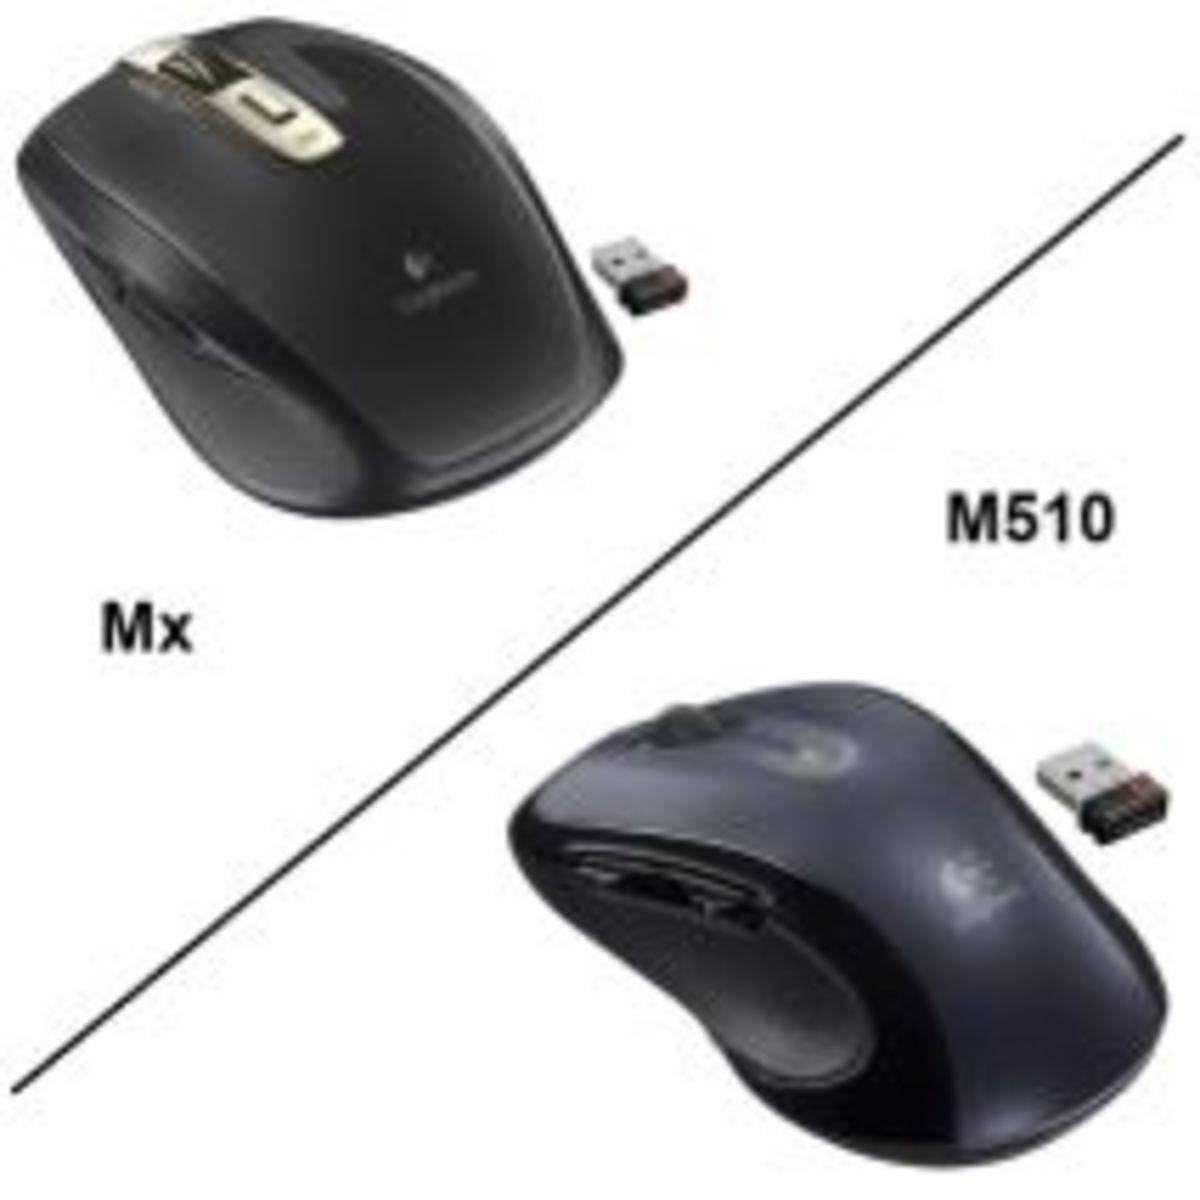 logitech-m510-vs-logitech-mx